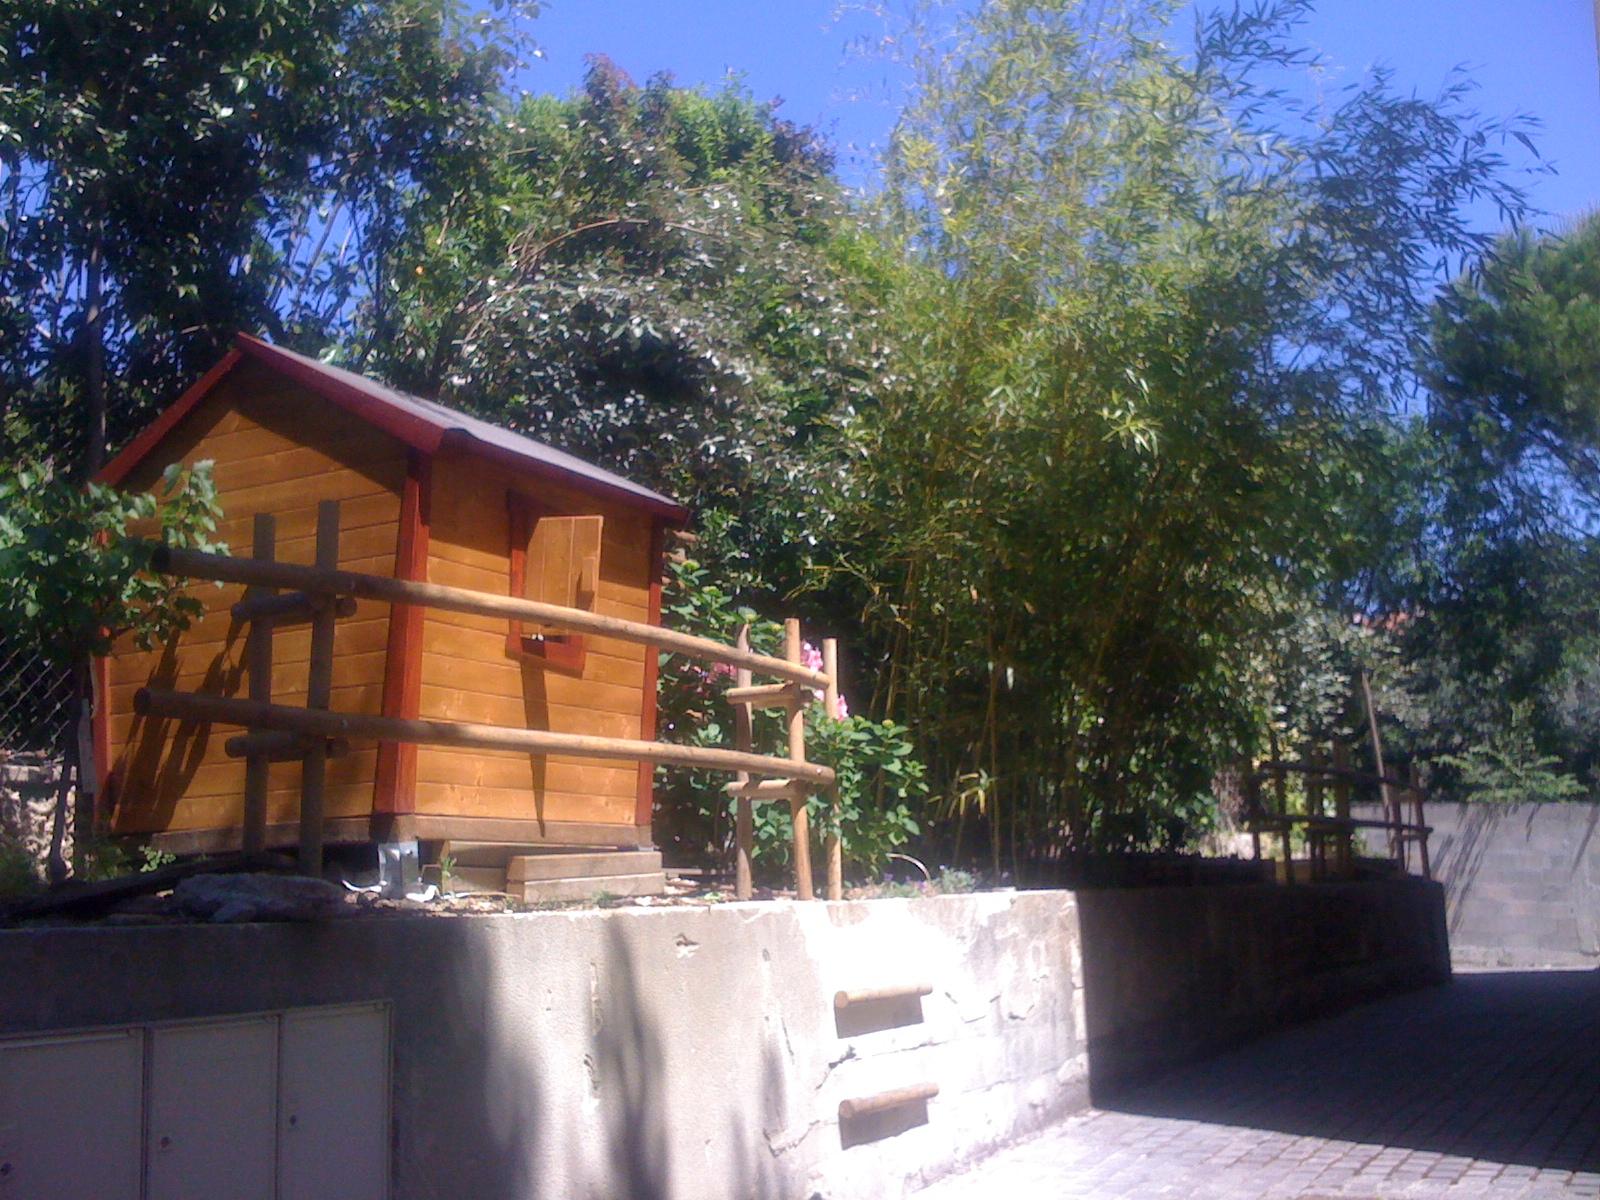 Le Jardin Cabane De Carla - Communauté Leroy Merlin serapportantà Chalet De Jardin Leroy Merlin